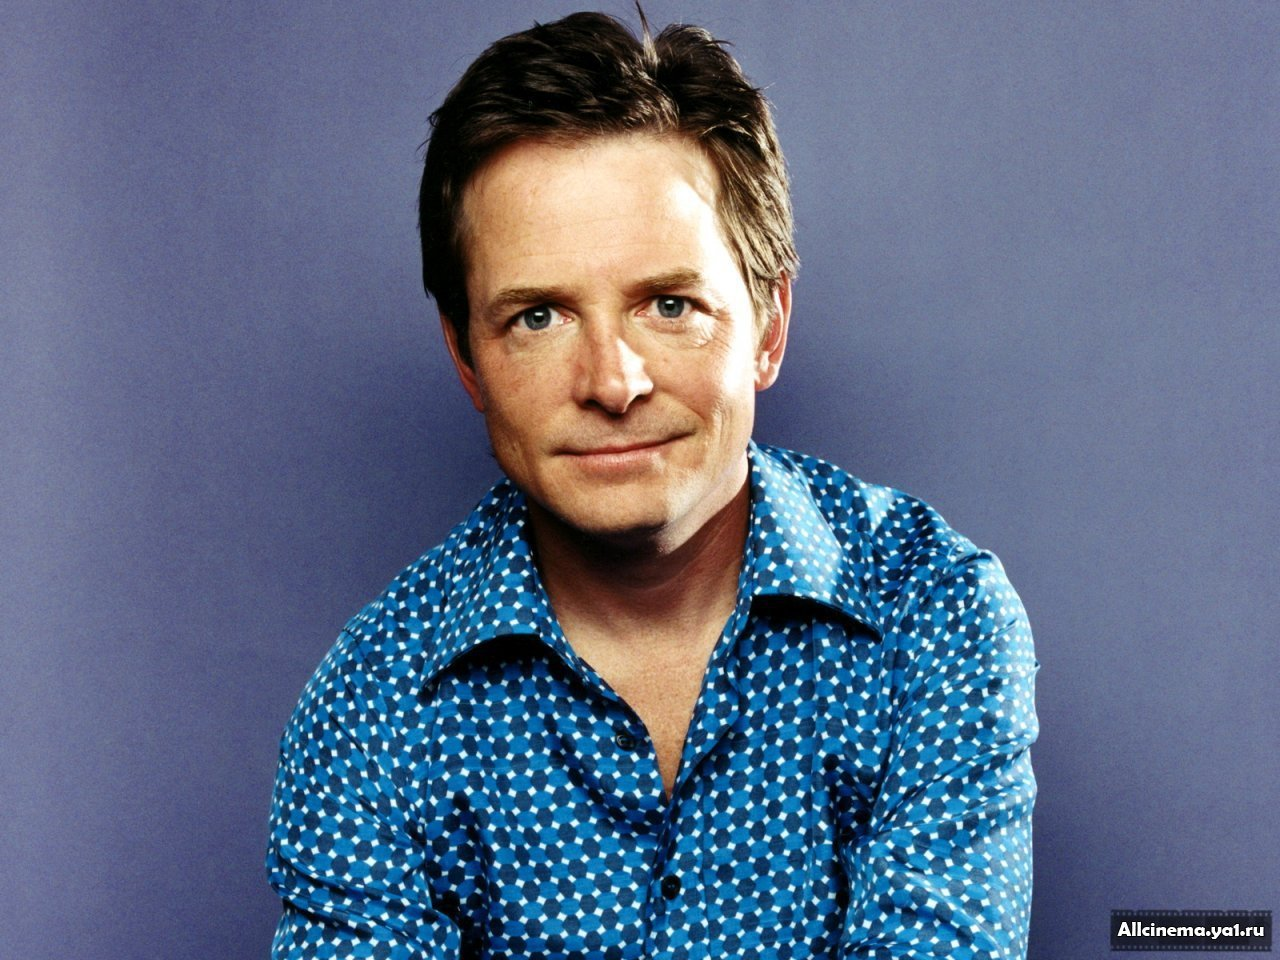 Michael-J-Fox-michael-j-fox-11265218-1280-